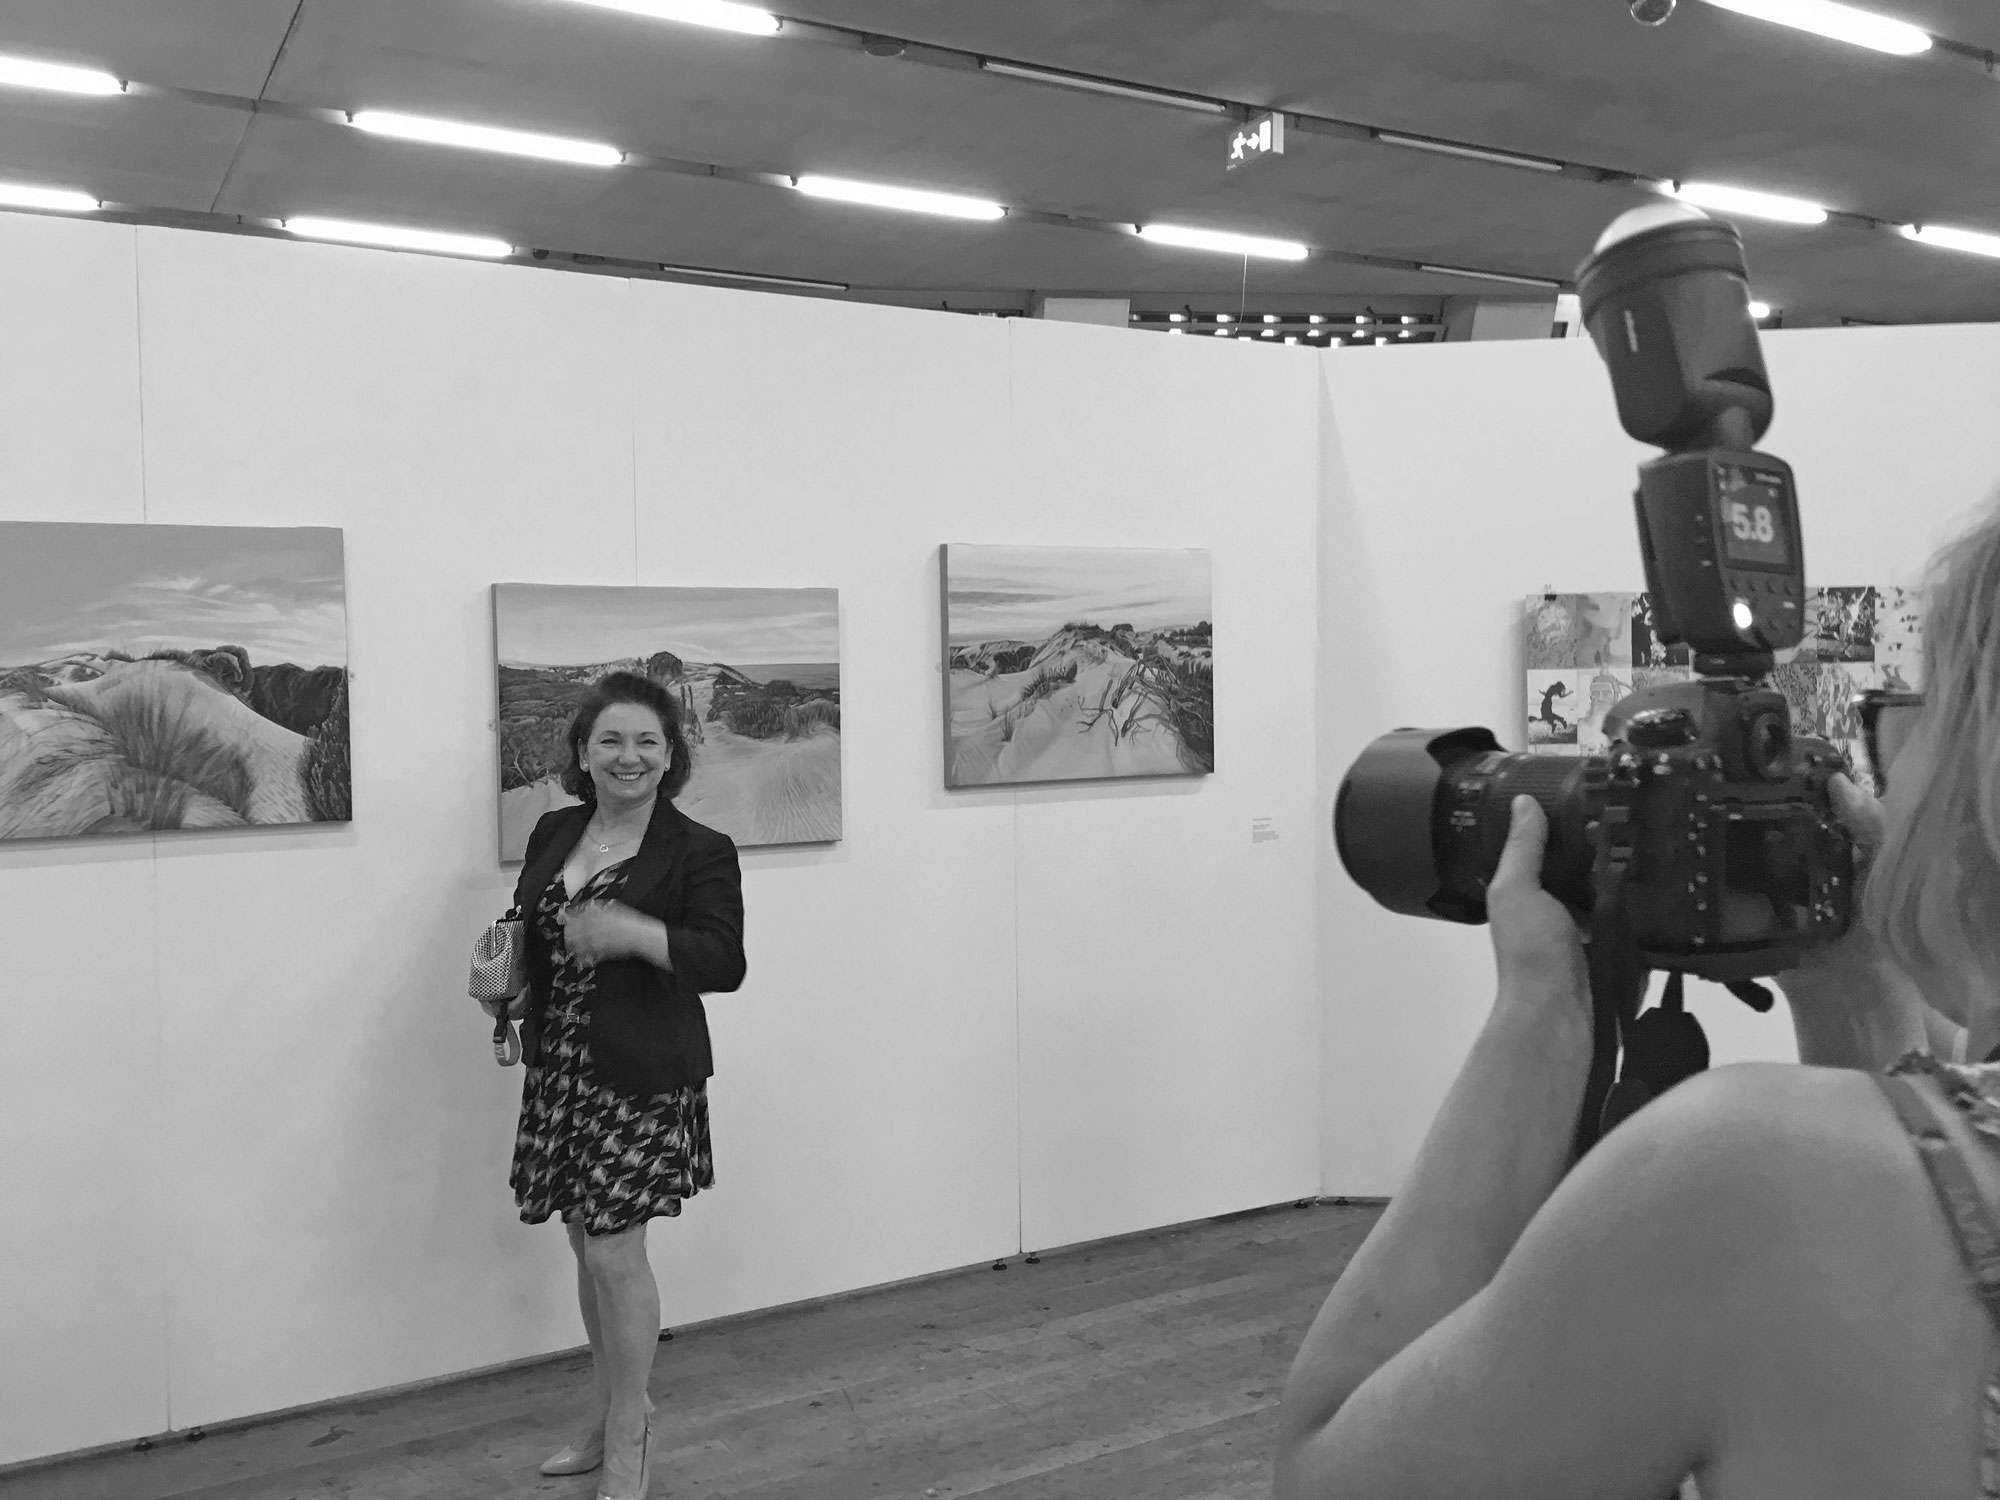 Olga calado Exhibition at Tate Modern